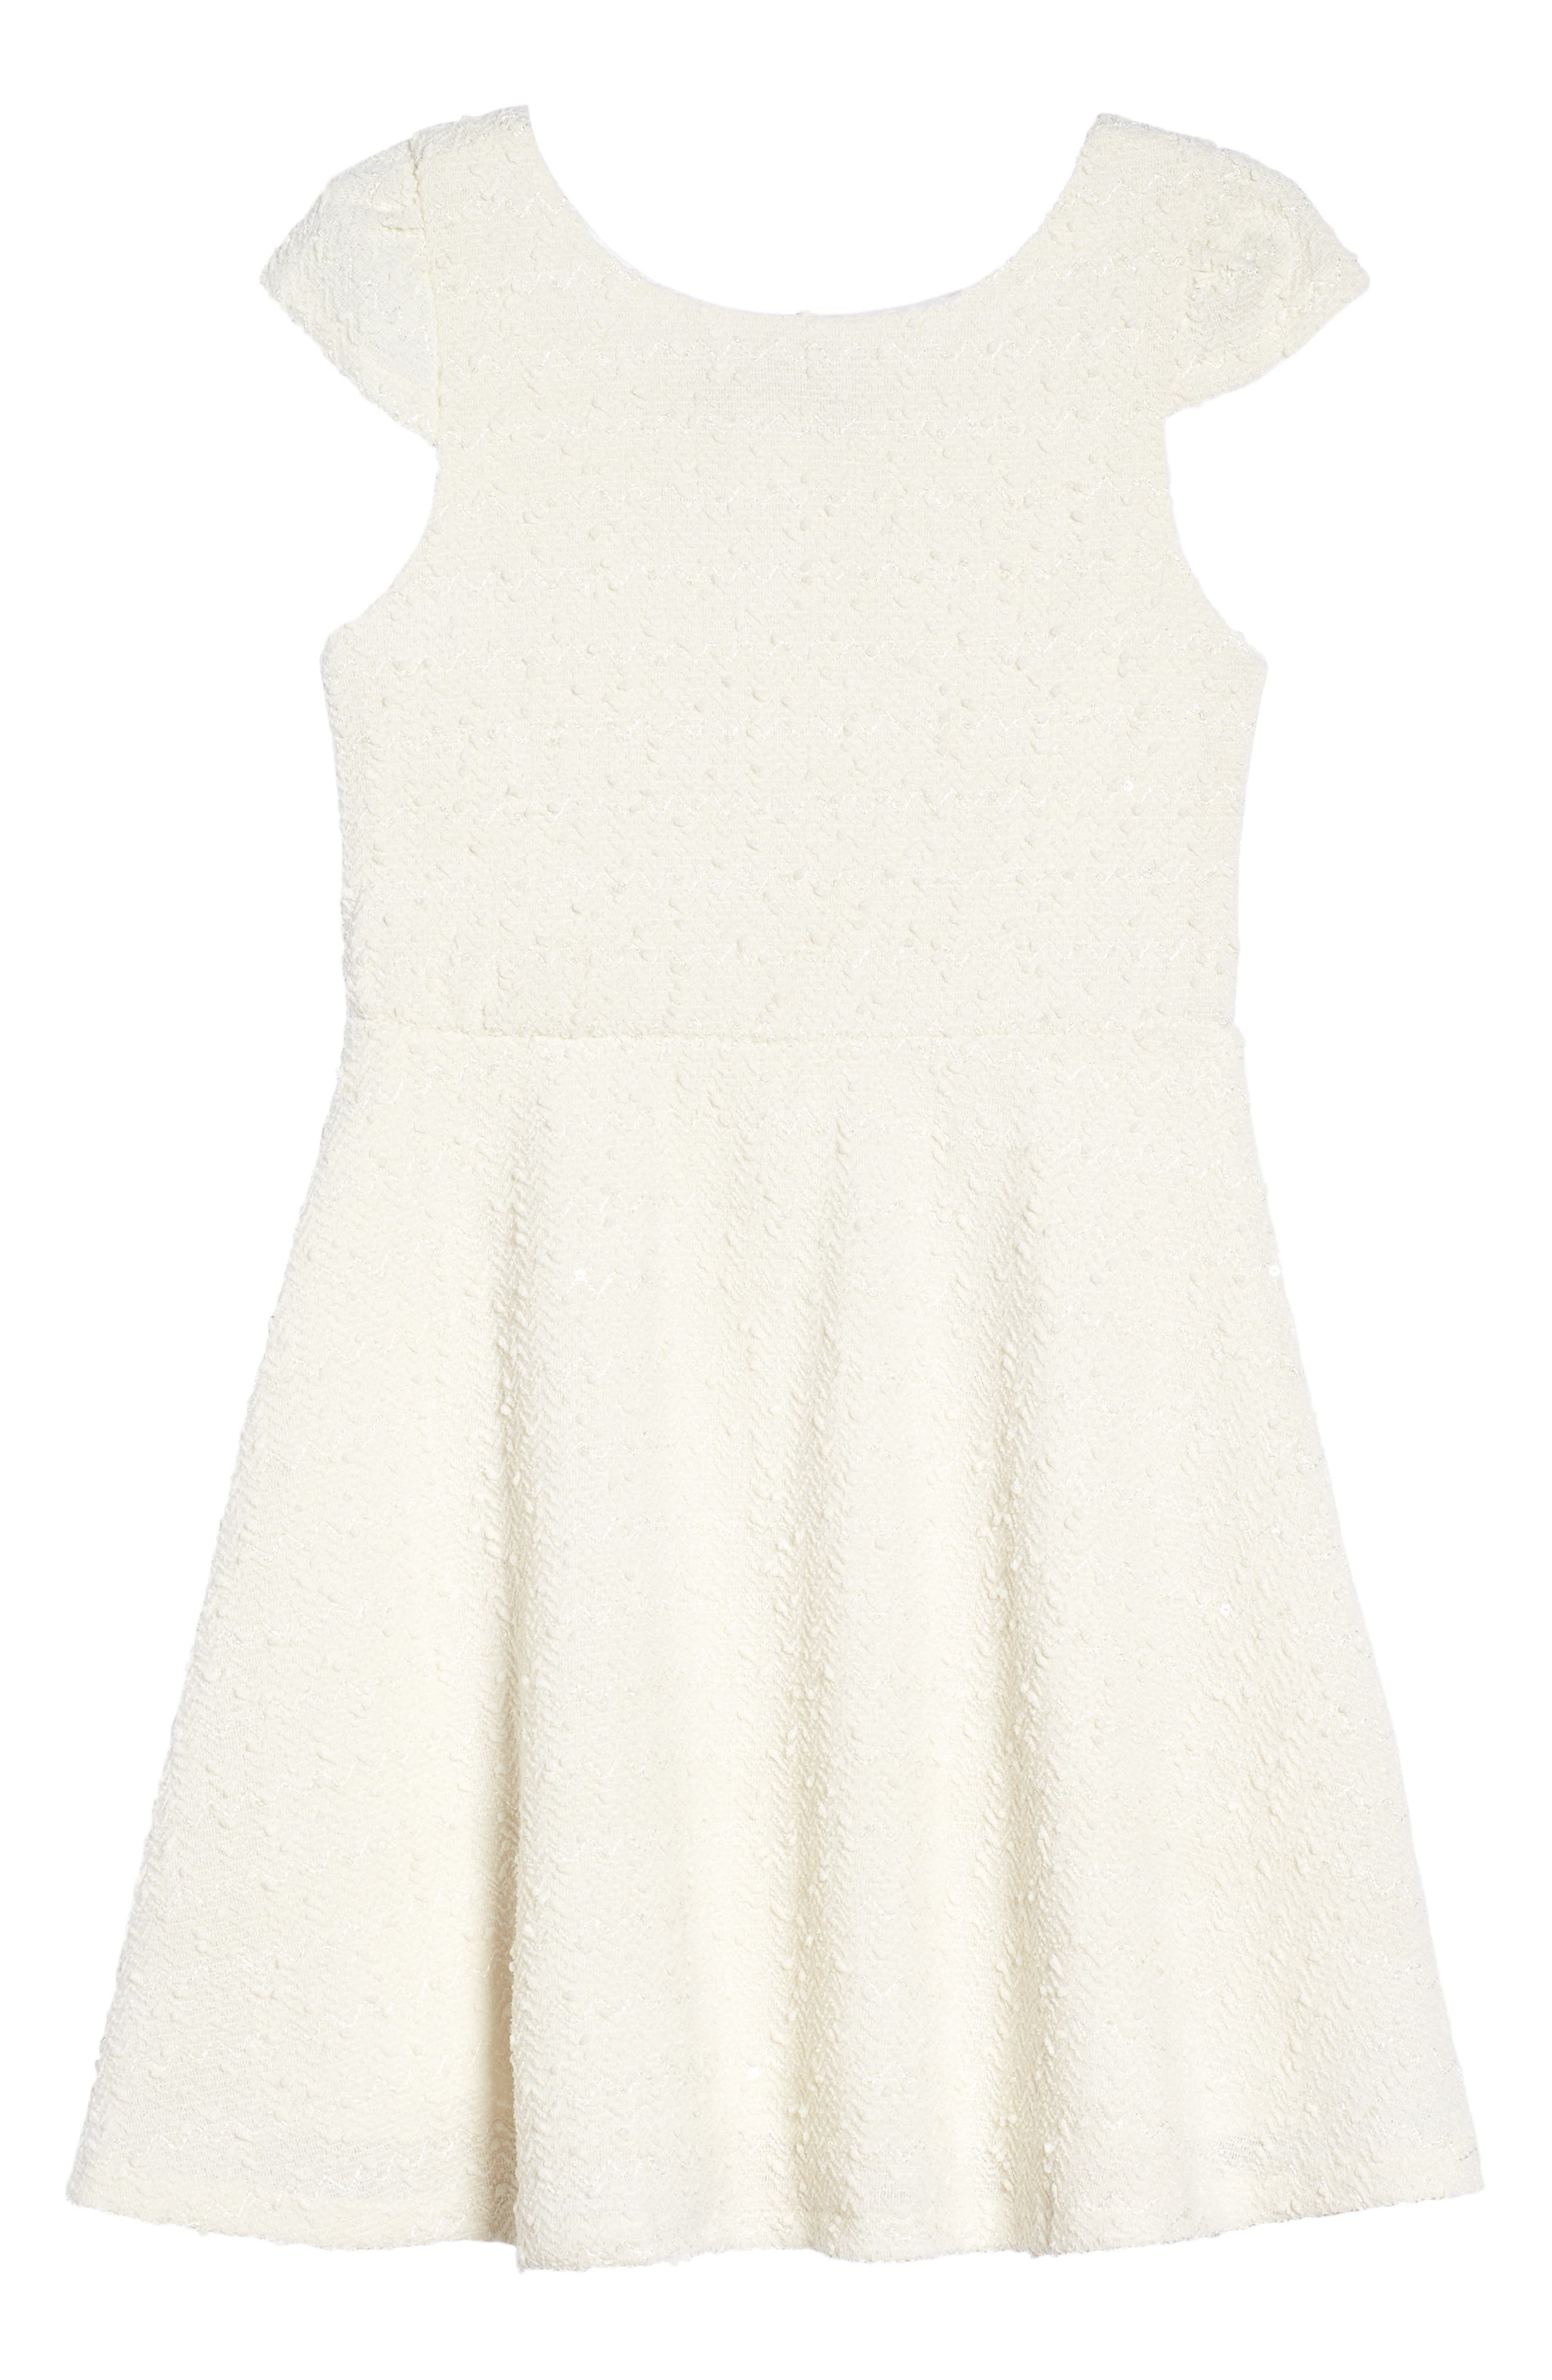 Carly Cap Sleeve Dress,                             Main thumbnail 1, color,                             250